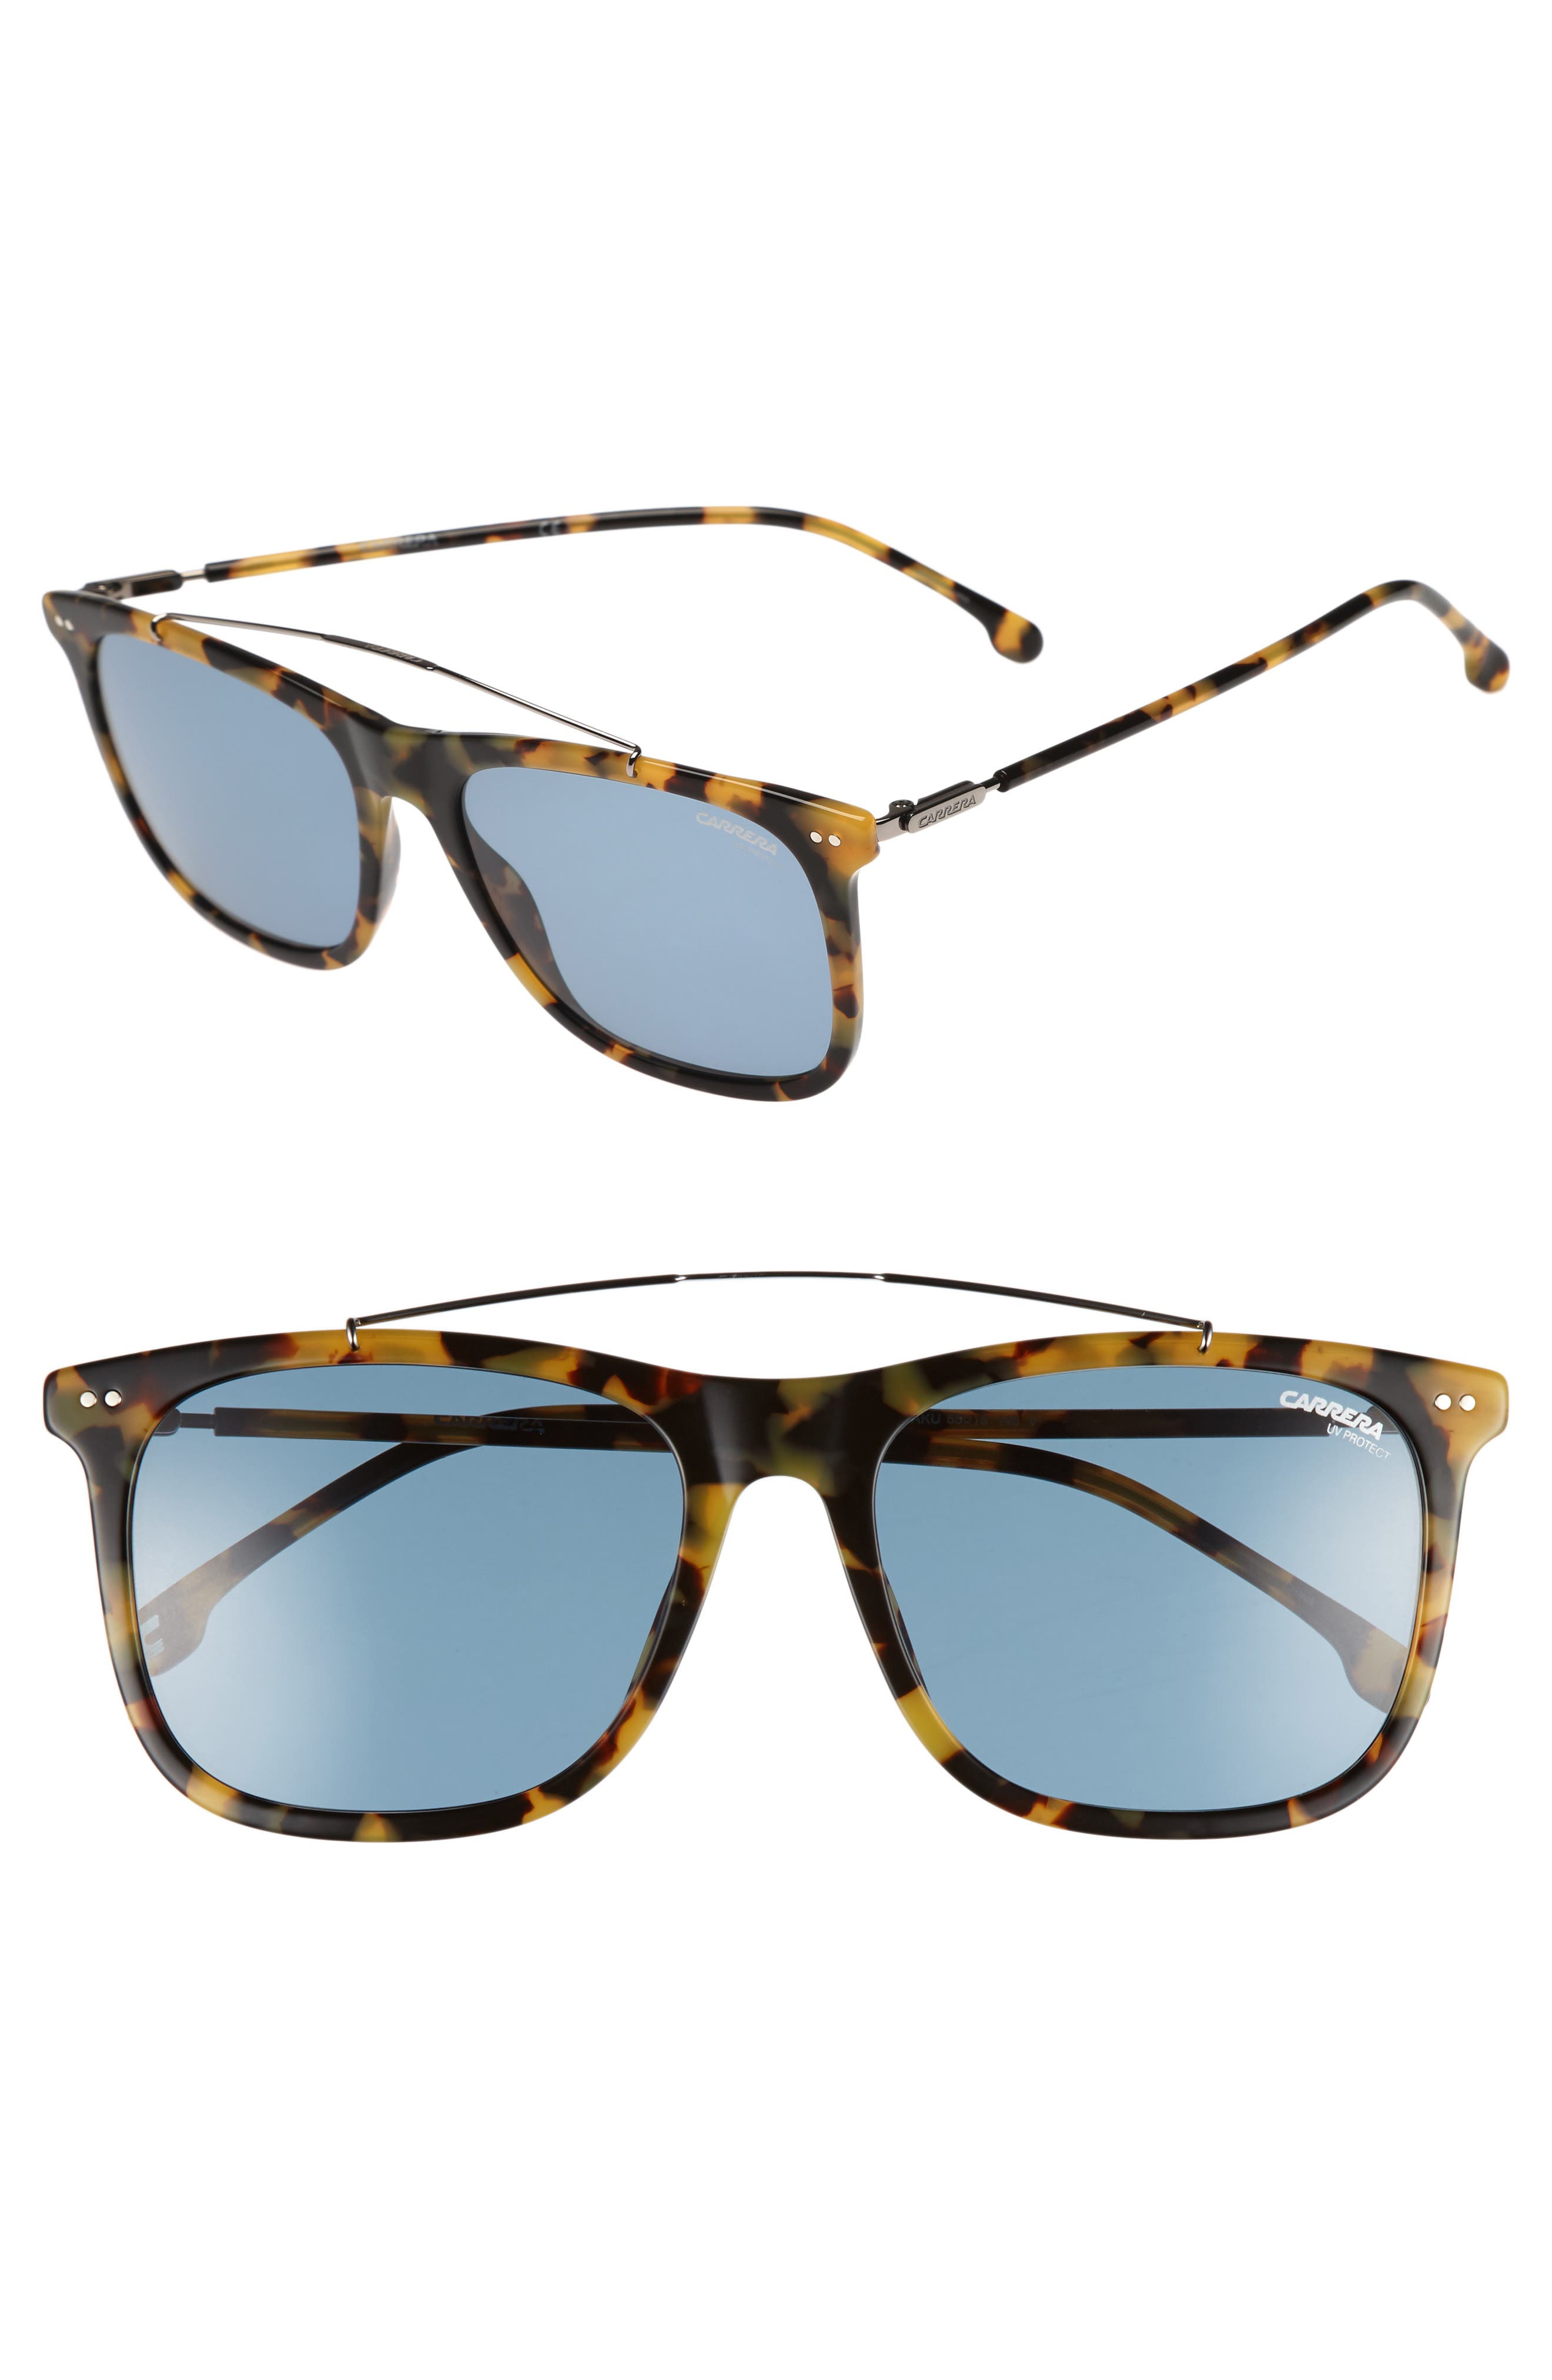 Carrera 150/S 55mm Sunglasses,                         Main,                         color, Havana Ruthenium/ Blue Avio